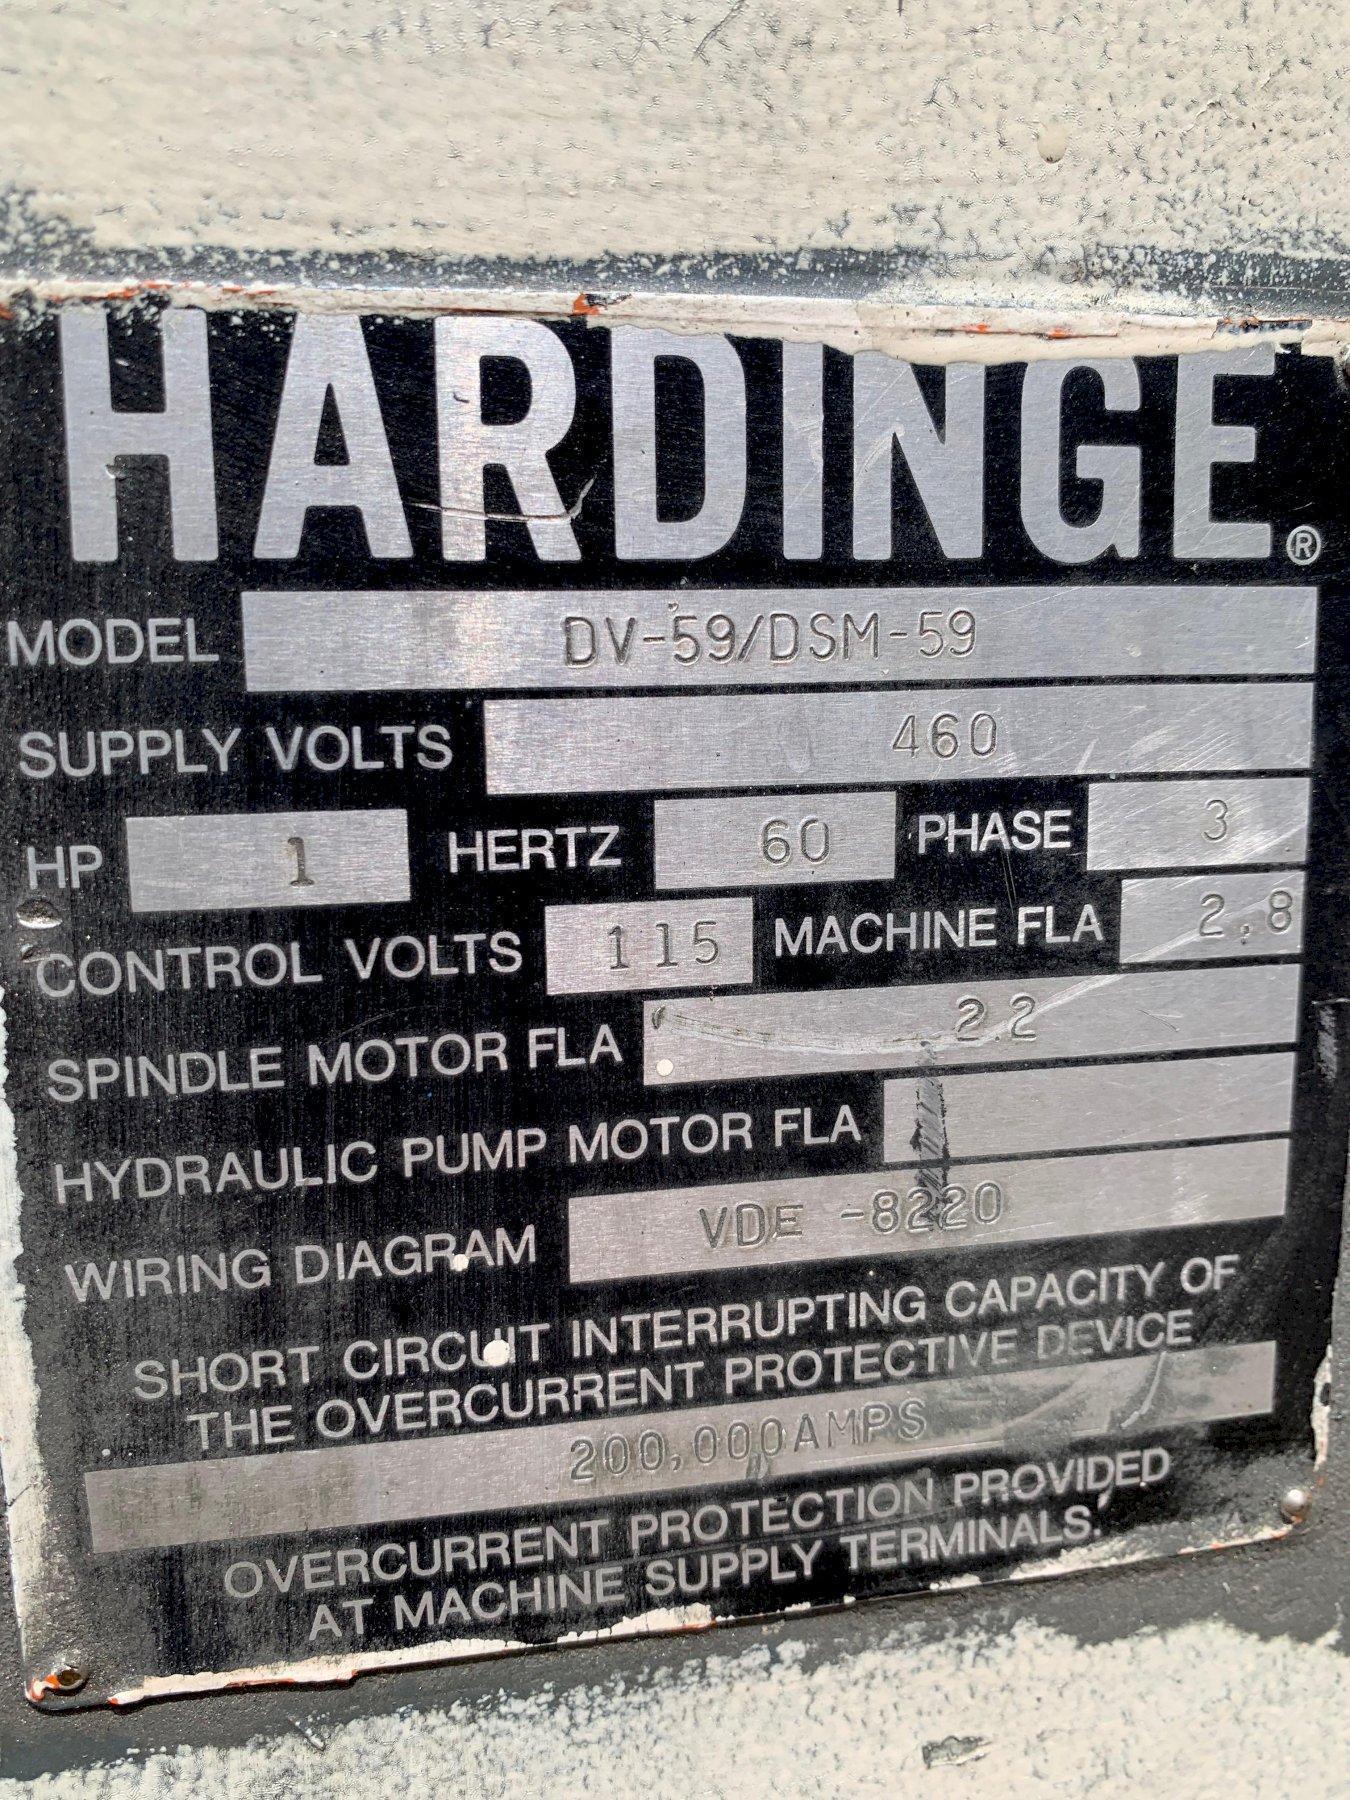 Hardinge Super-Precision Lathe Model DV59-DSM59